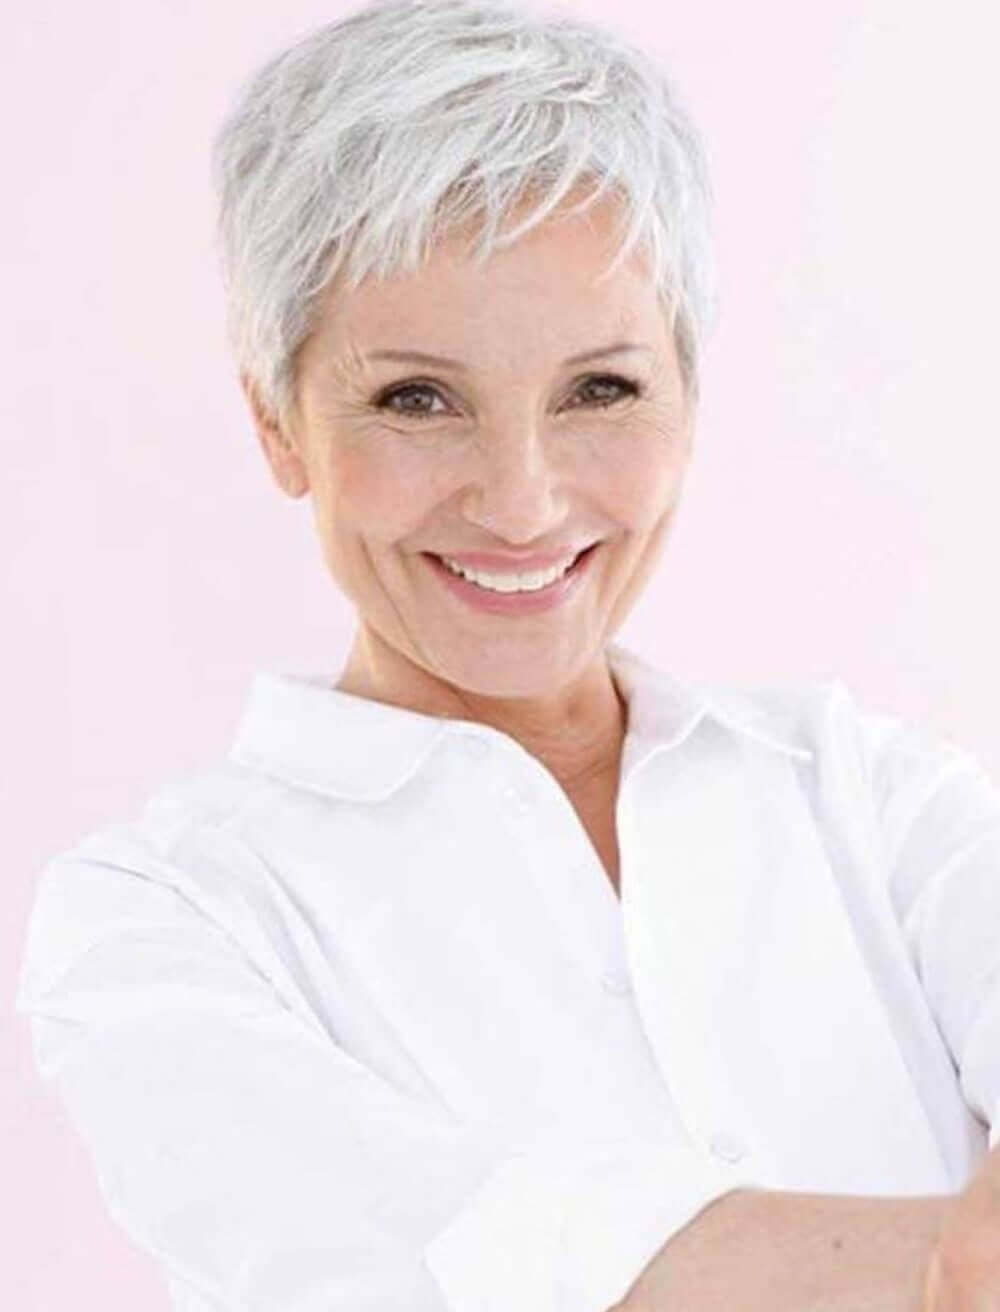 Idee Van Gea Nijzing Op Kapsel In 2020 Korte Kapsels Voor Oudere Dames Kapsels Voor Kort Haar